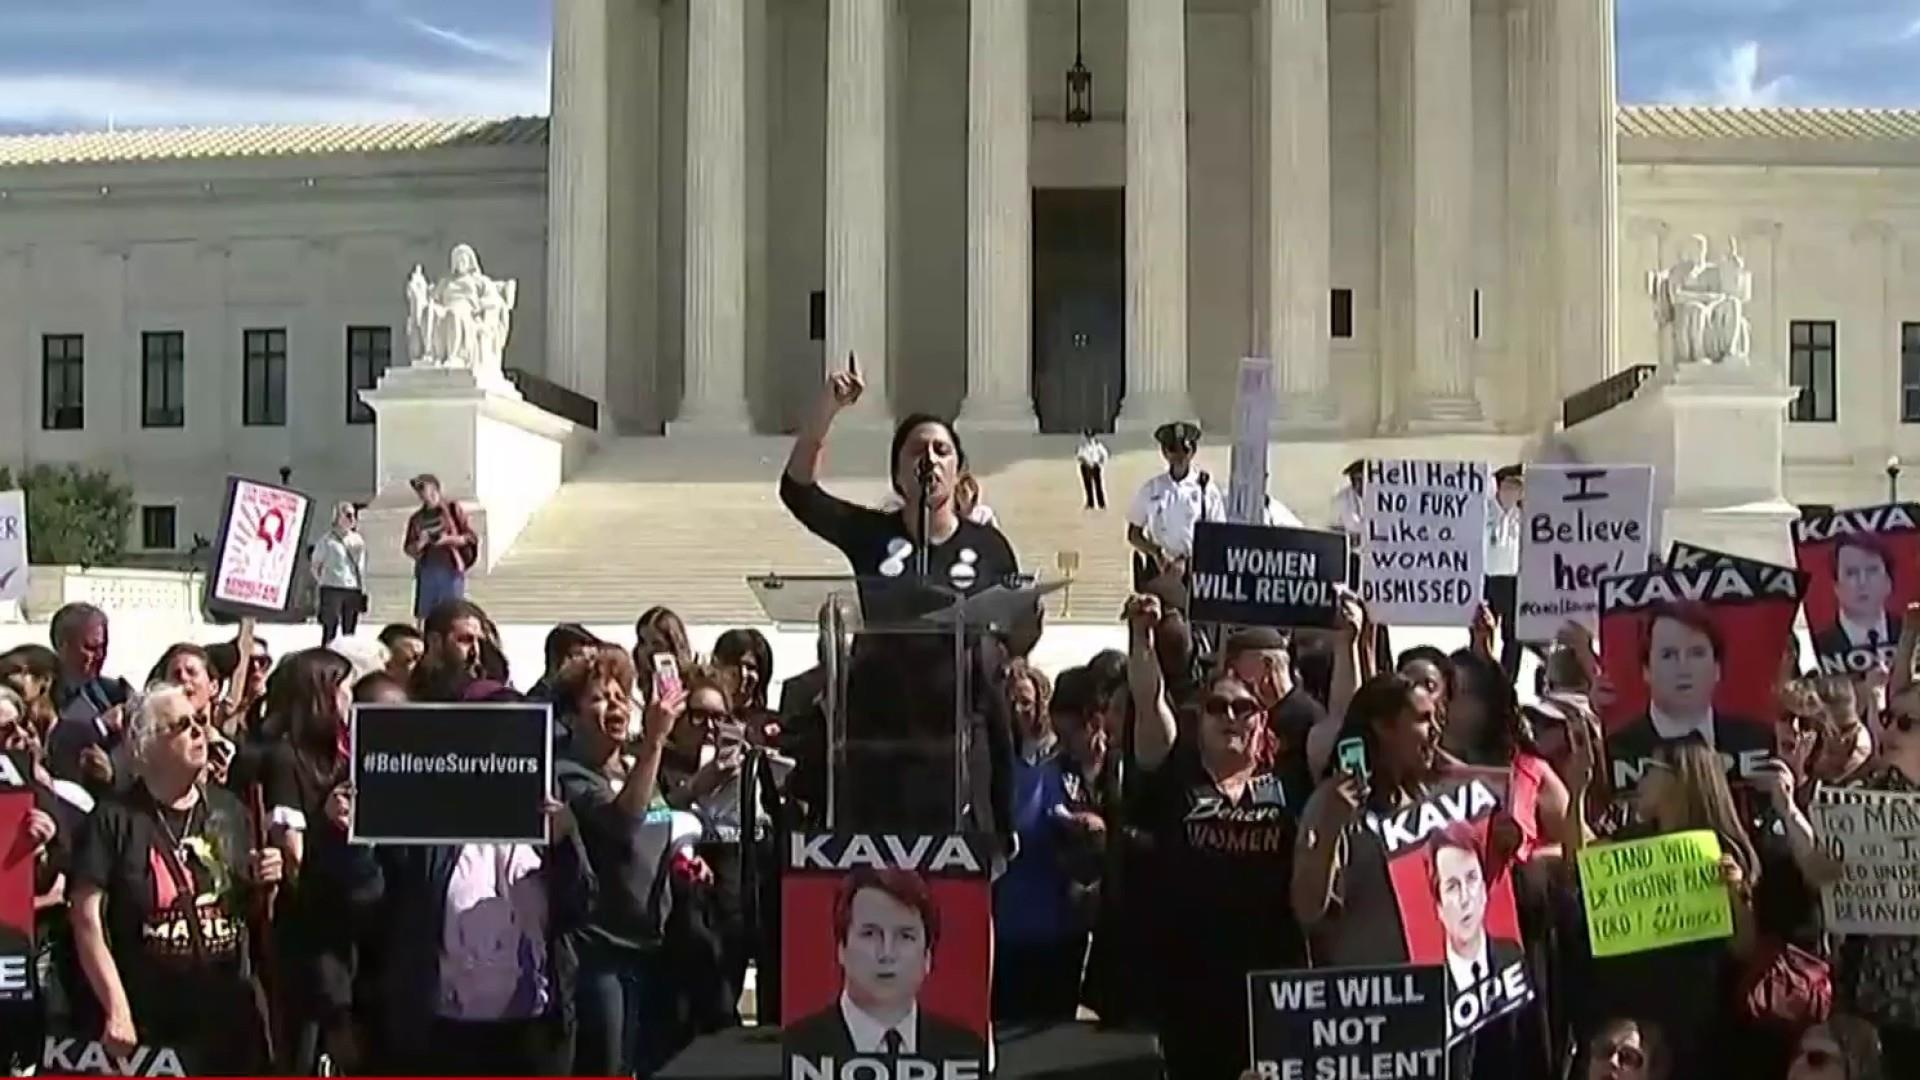 Protestors to GOP: November is coming